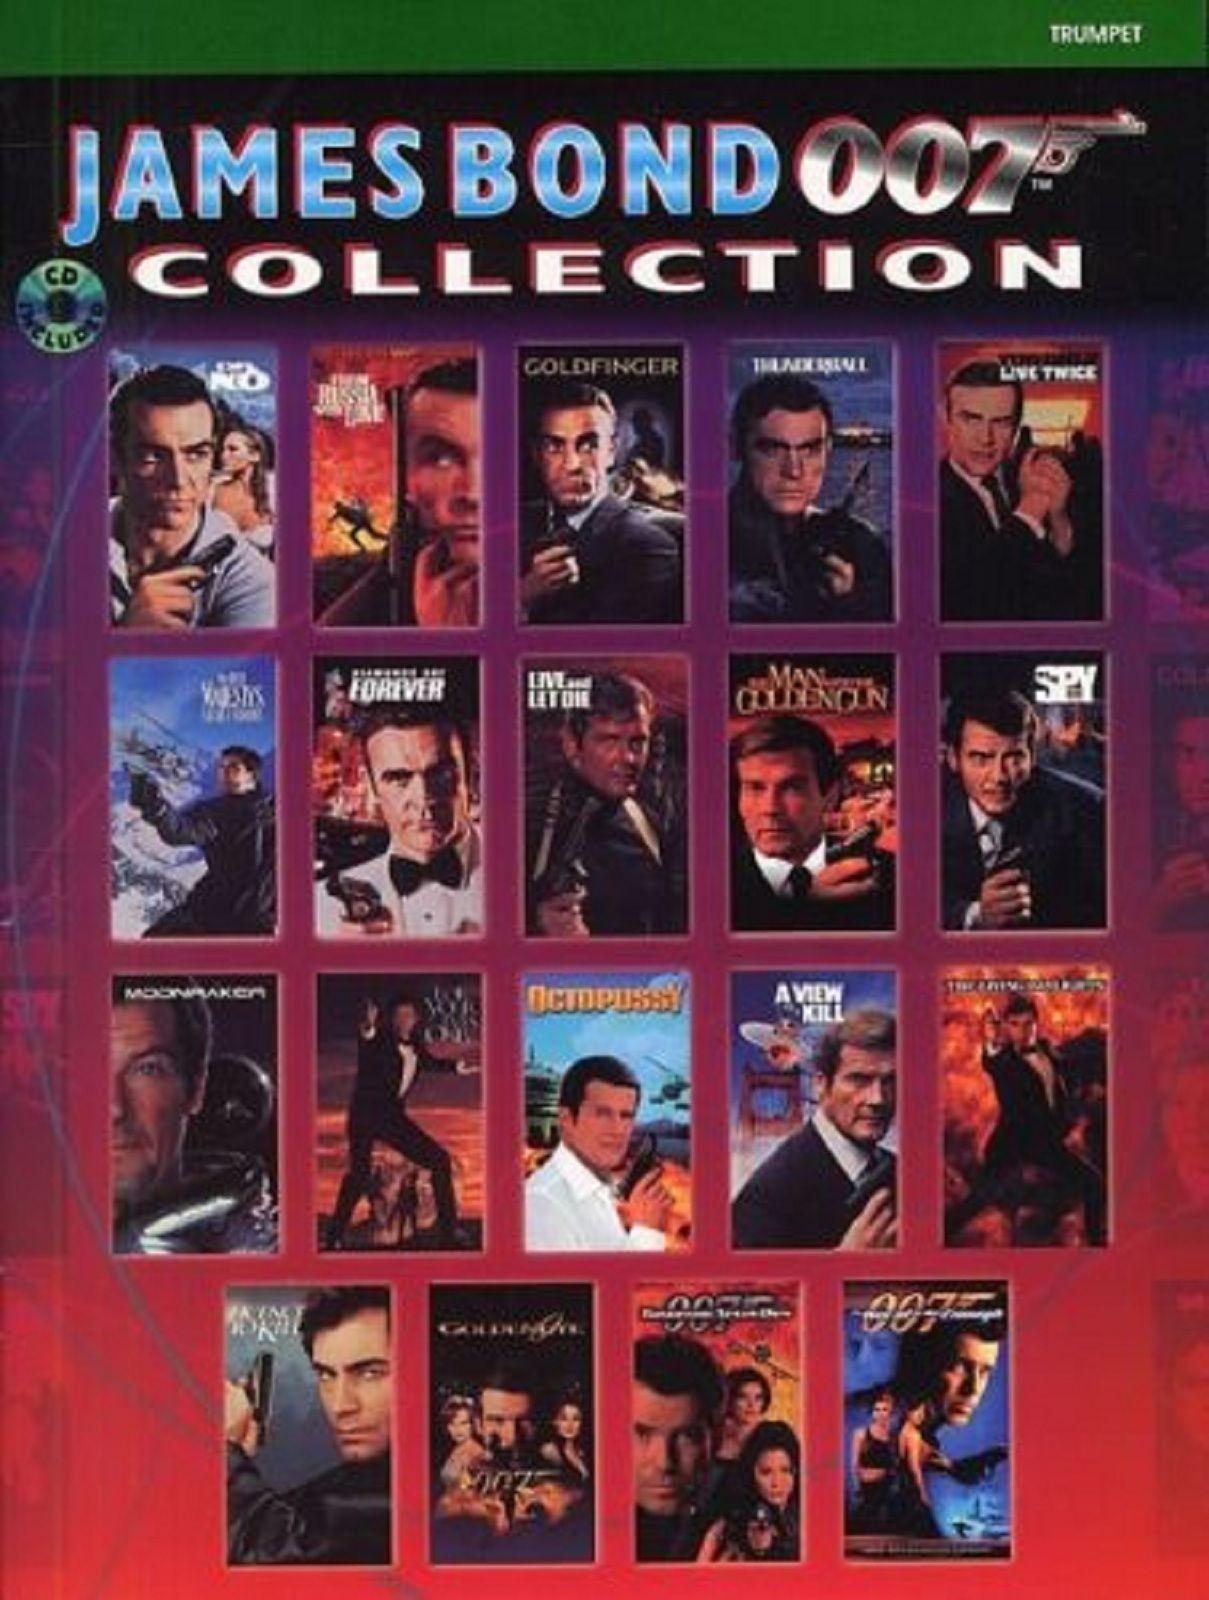 James Bond 007 Collection Trumpet Spy Film Theme Music Book CD Goldfinger S130